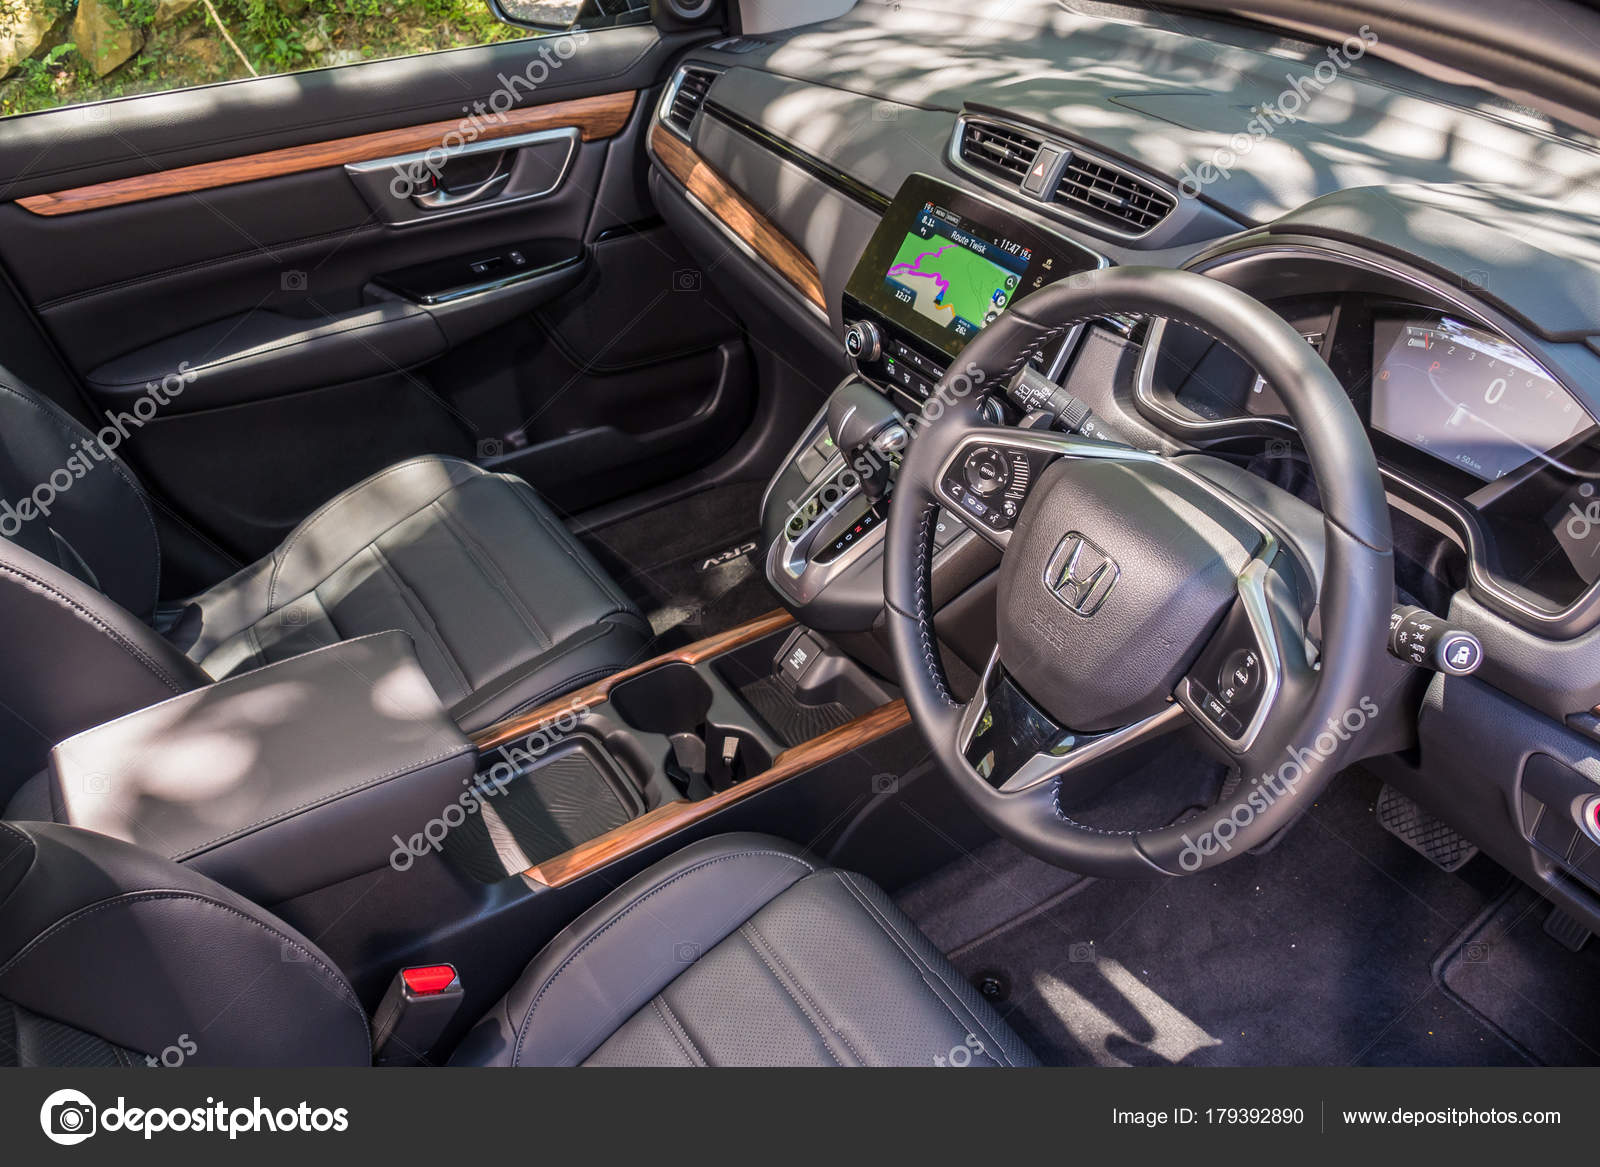 Crv 2017 Interior >> Honda Cr V 2017 Interior Stock Editorial Photo